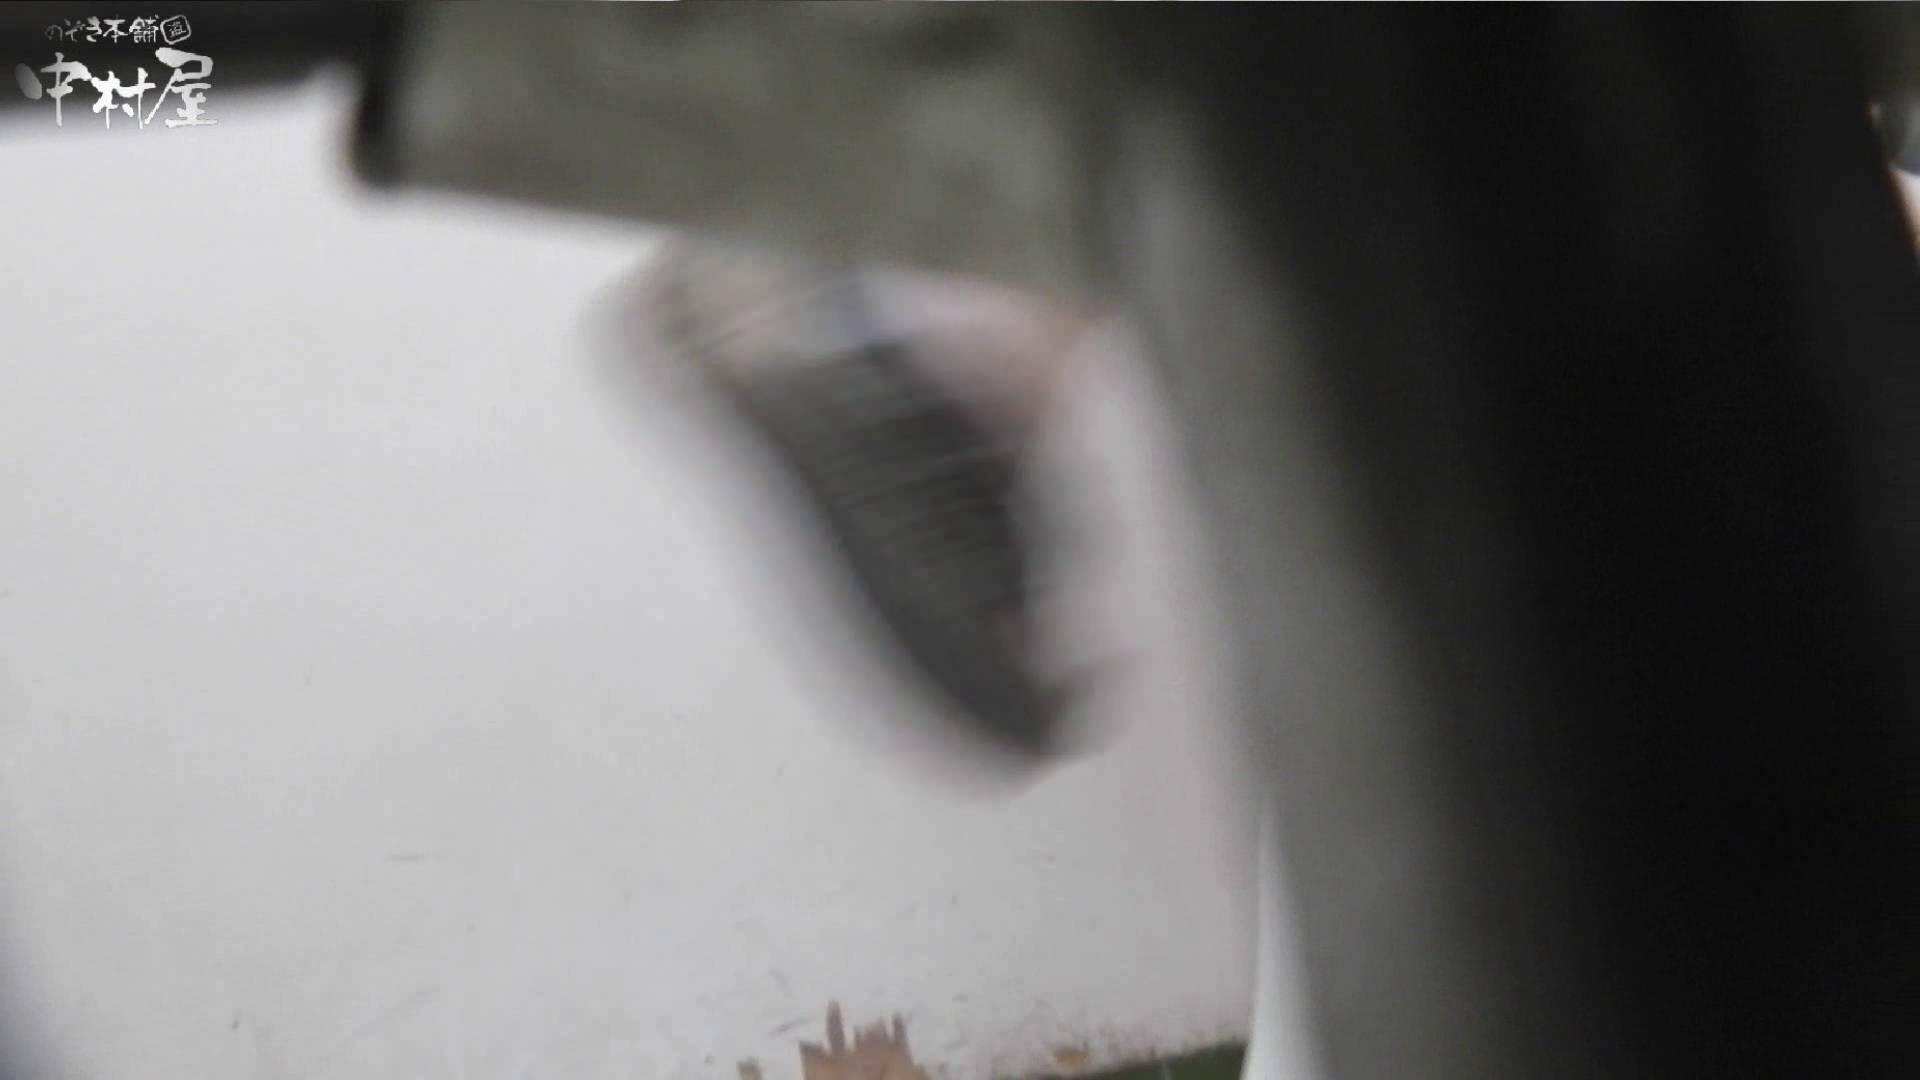 vol.31 命がけ潜伏洗面所! 半出しして諦めるポニテさん 洗面所編 ワレメ無修正動画無料 106PIX 53